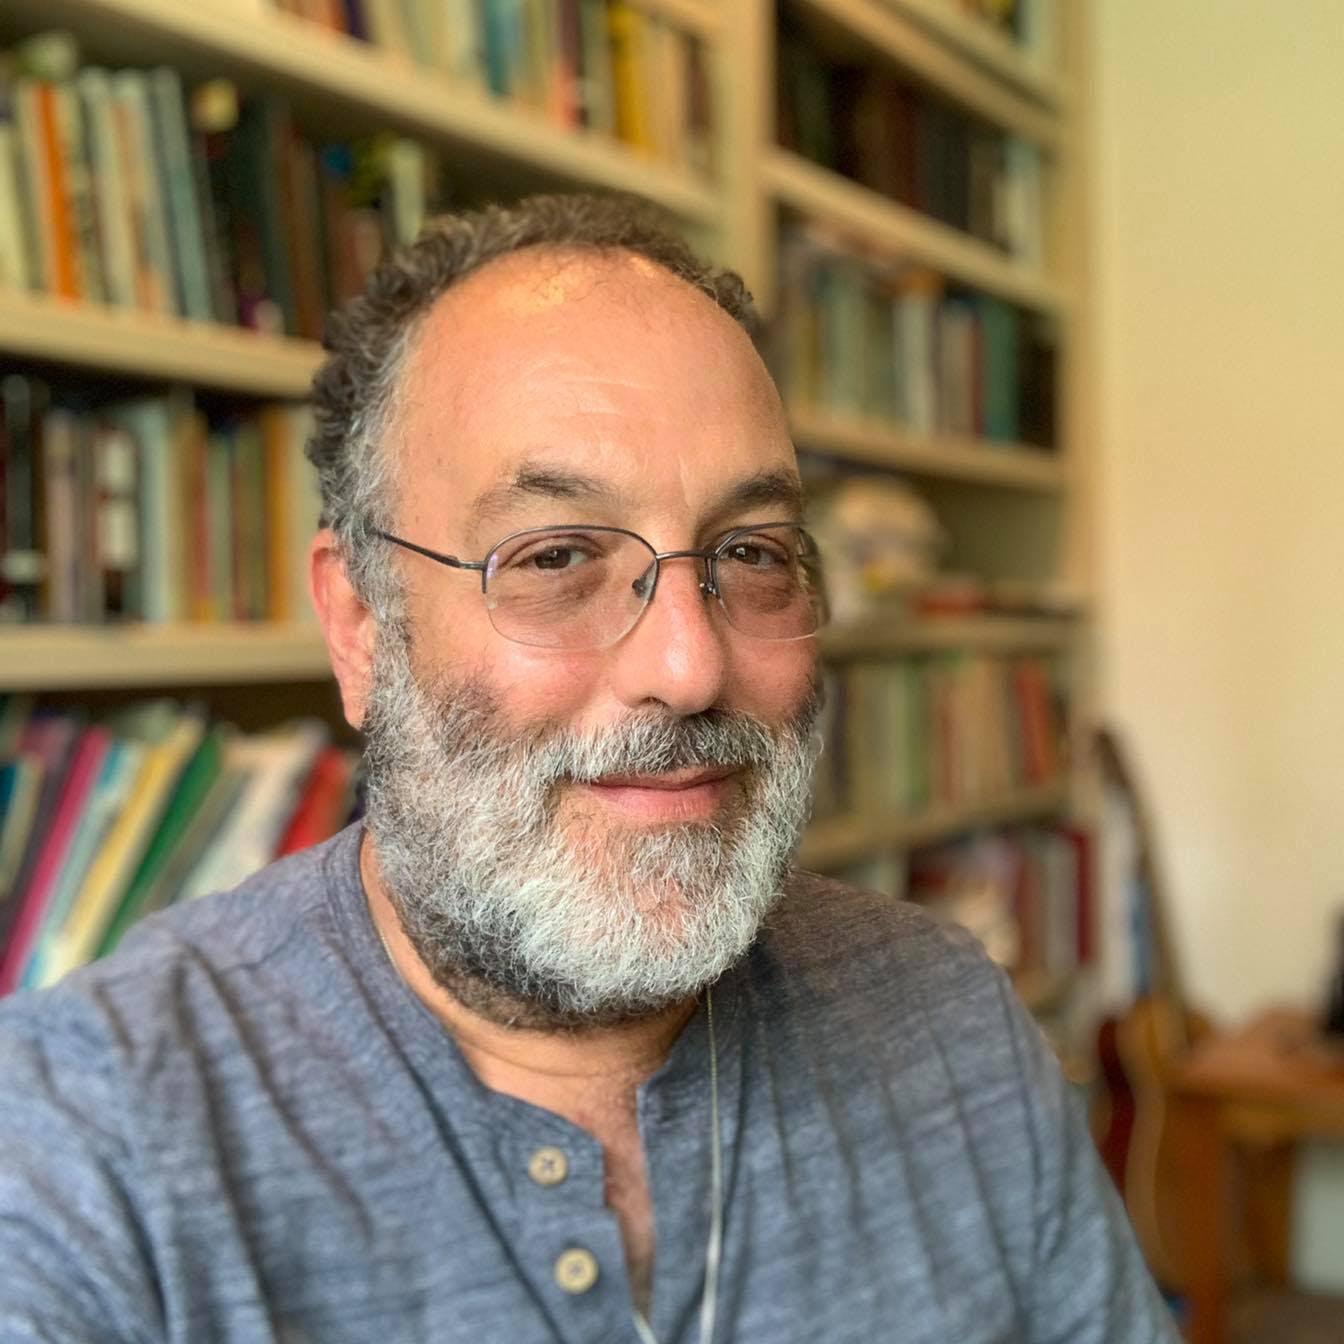 Professor of Social Welfare Ron Avi Astor